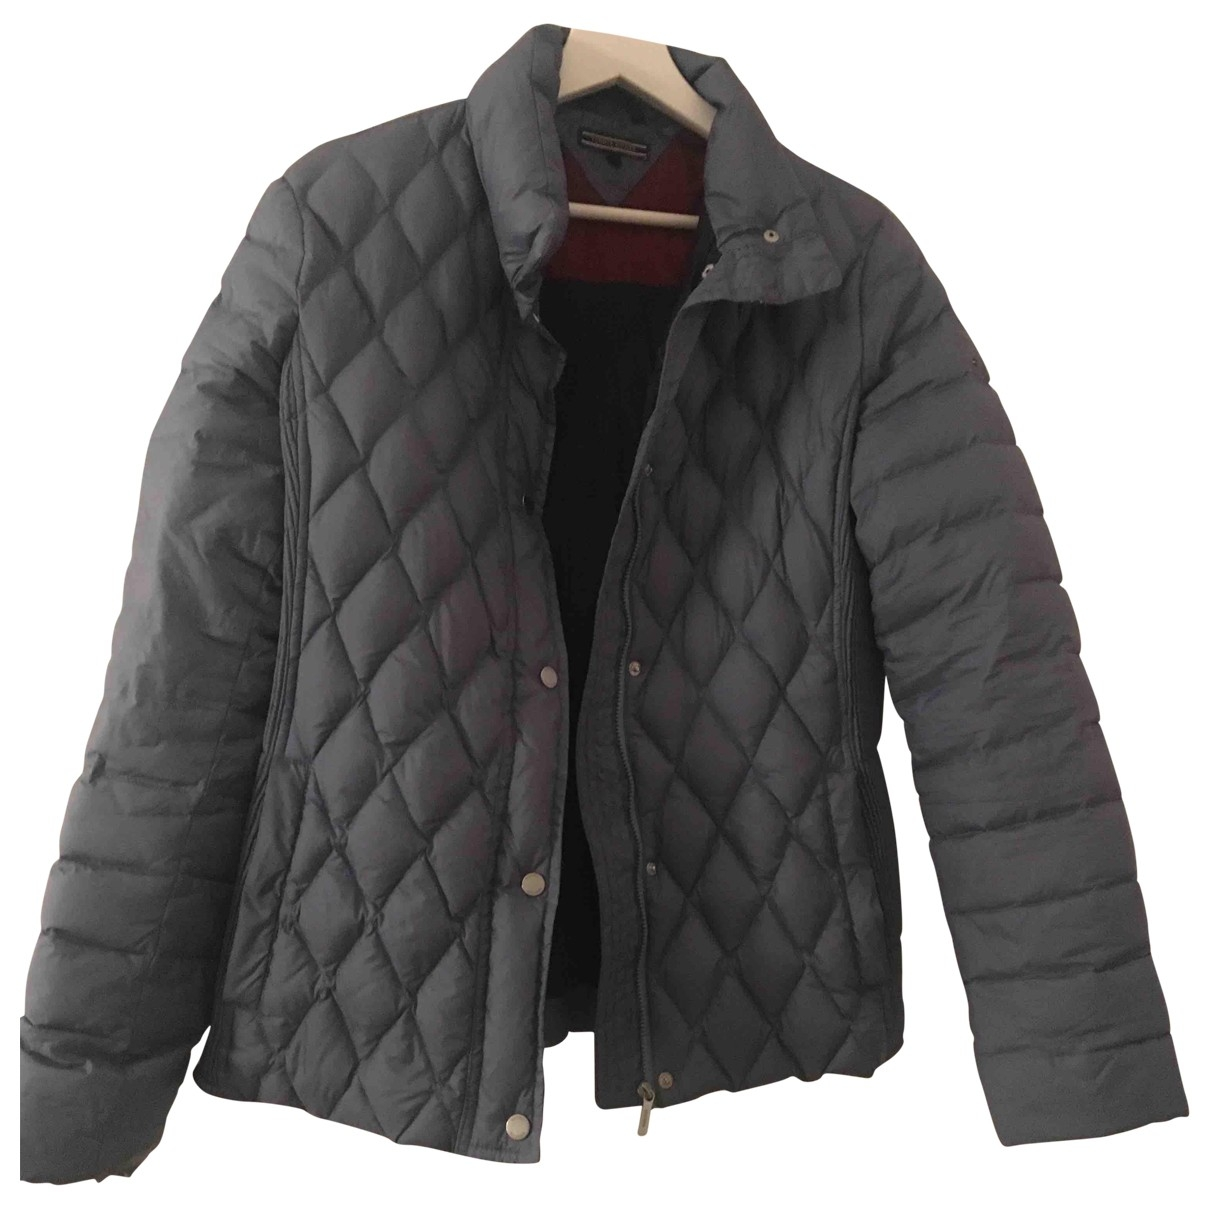 Tommy Hilfiger \N Blue jacket for Women M International